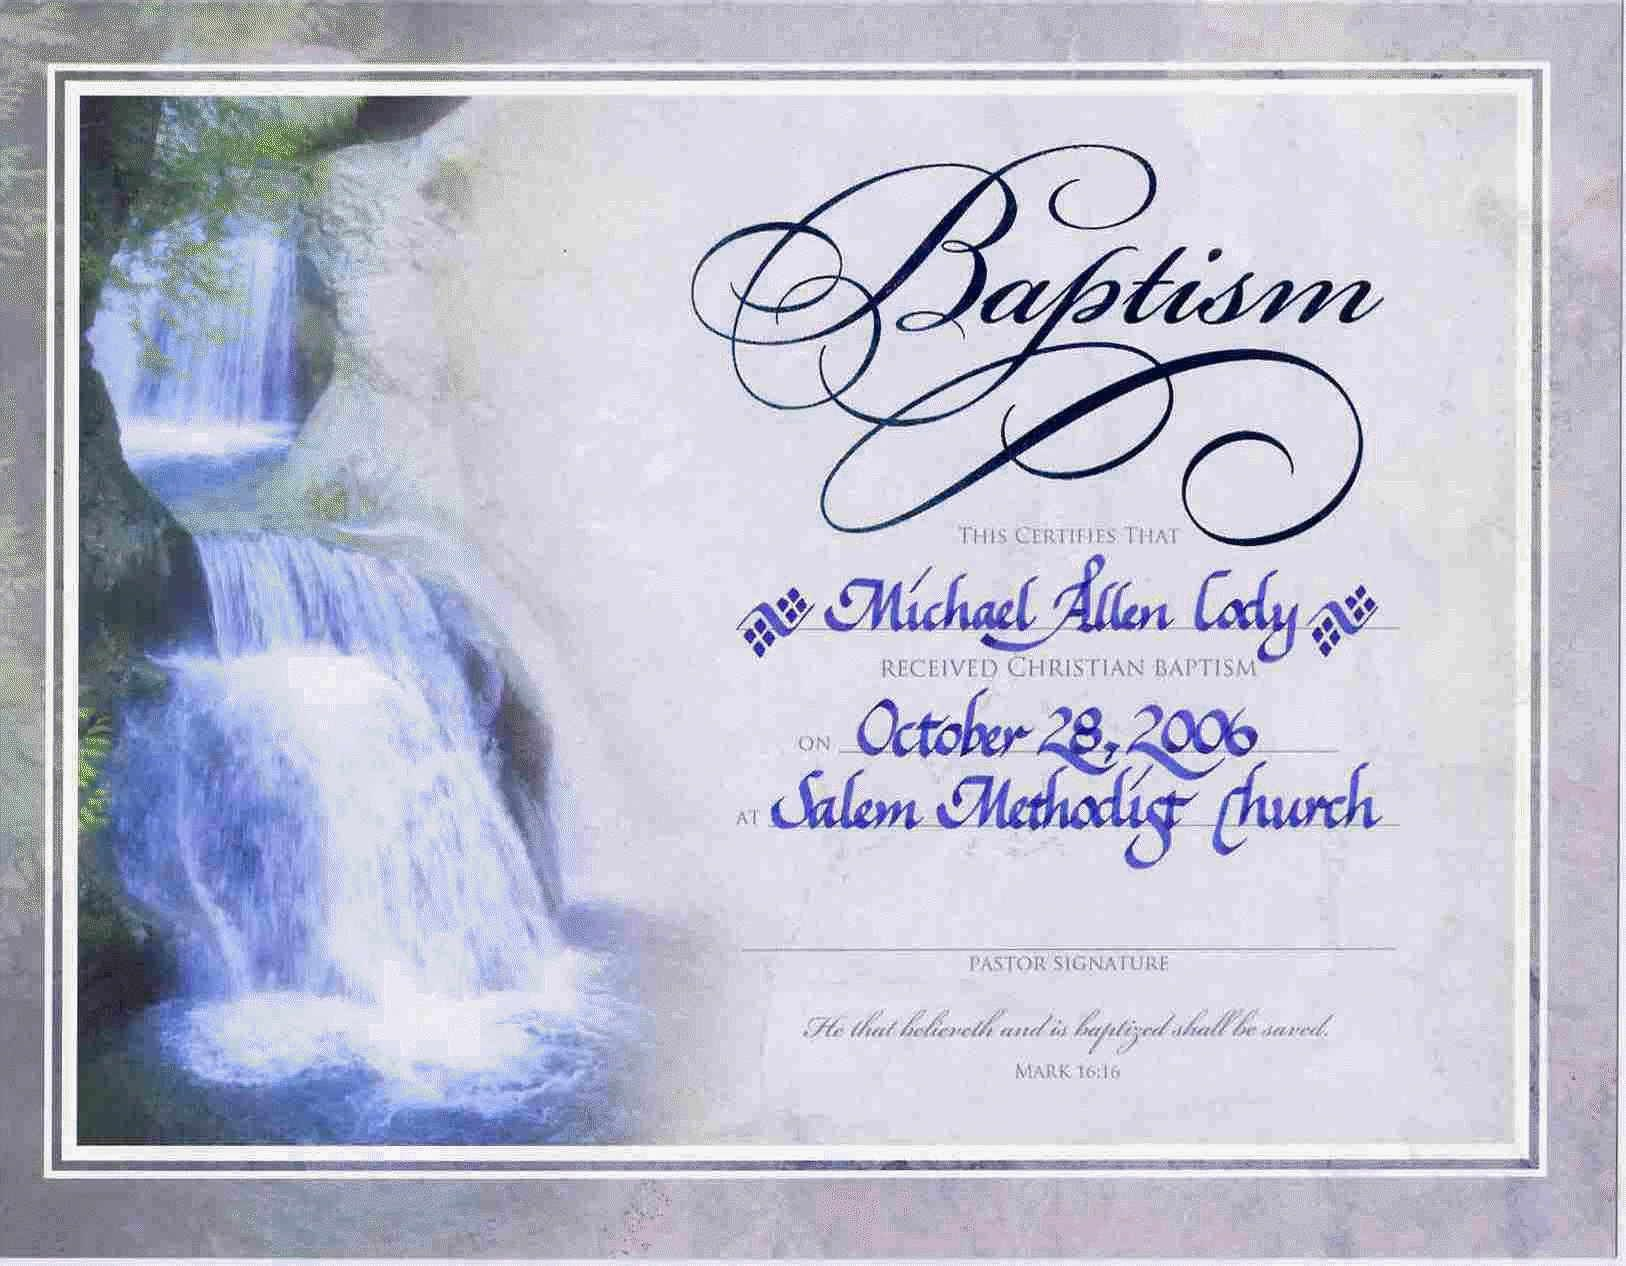 Water Baptism Certificate Templateencephaloscom Encephaloscom For Baptism Certificate Template Download